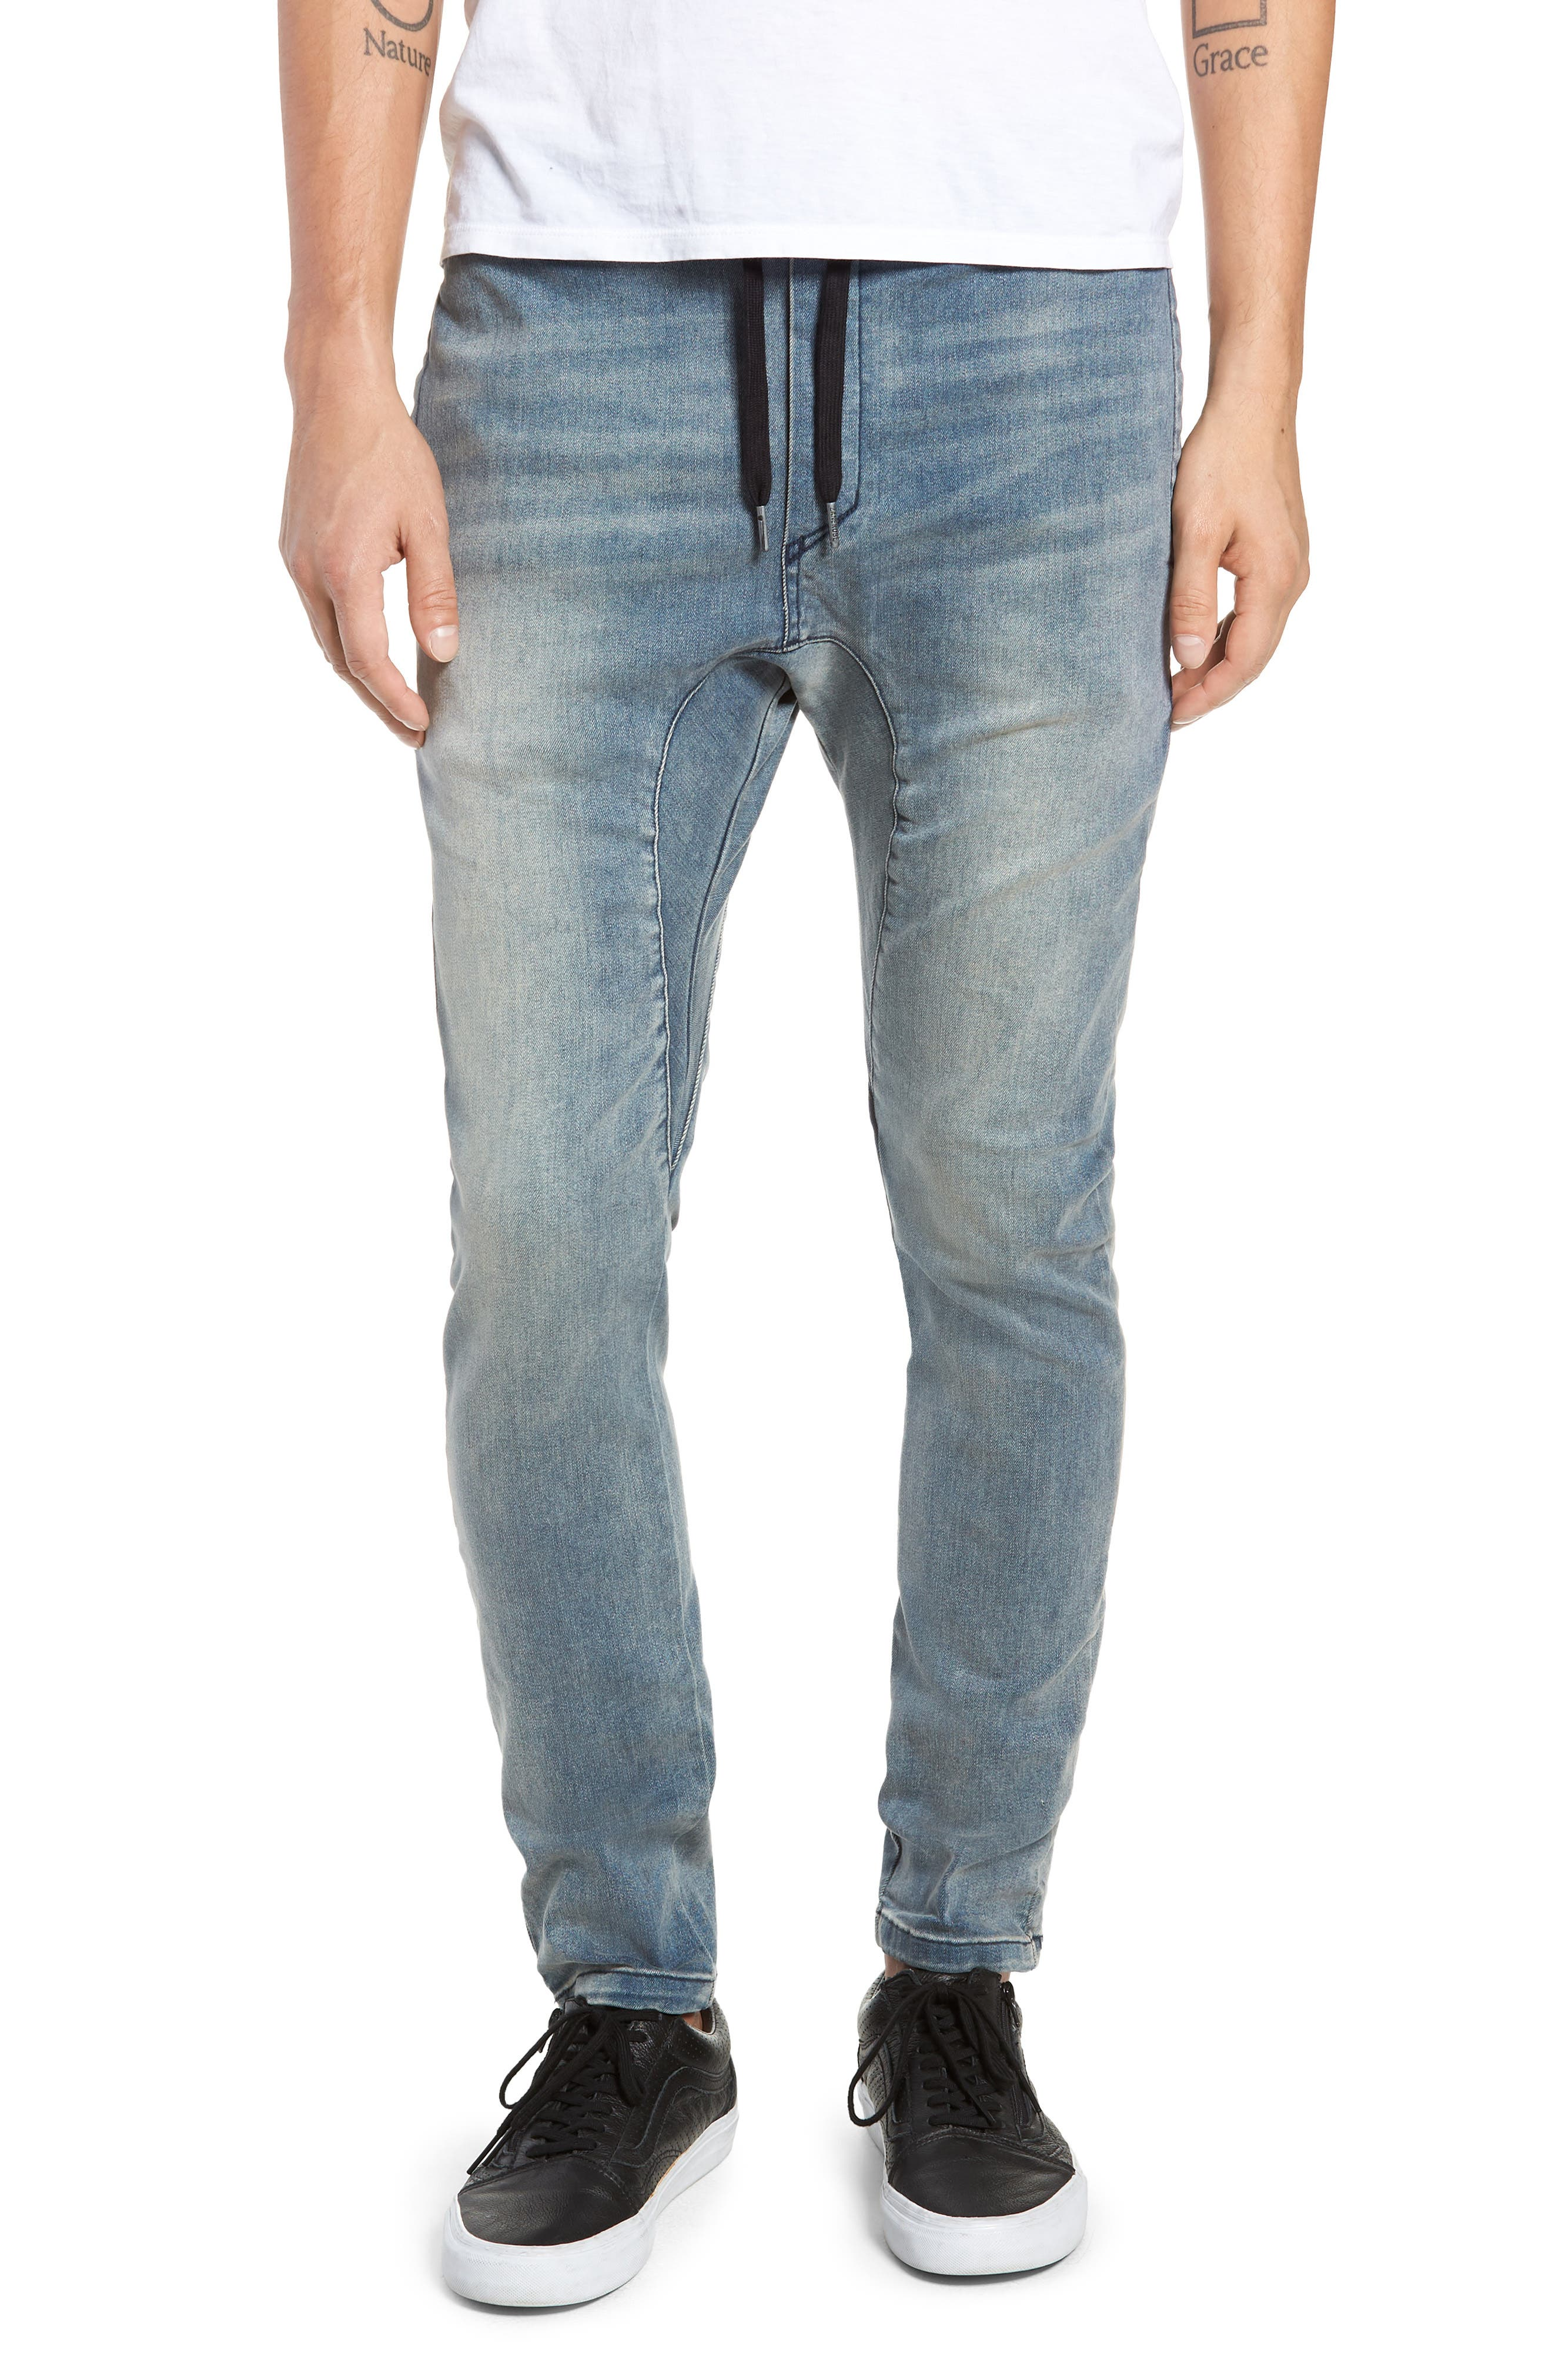 Salerno Flex Jeans,                             Main thumbnail 1, color,                             ABANDONED BLUE